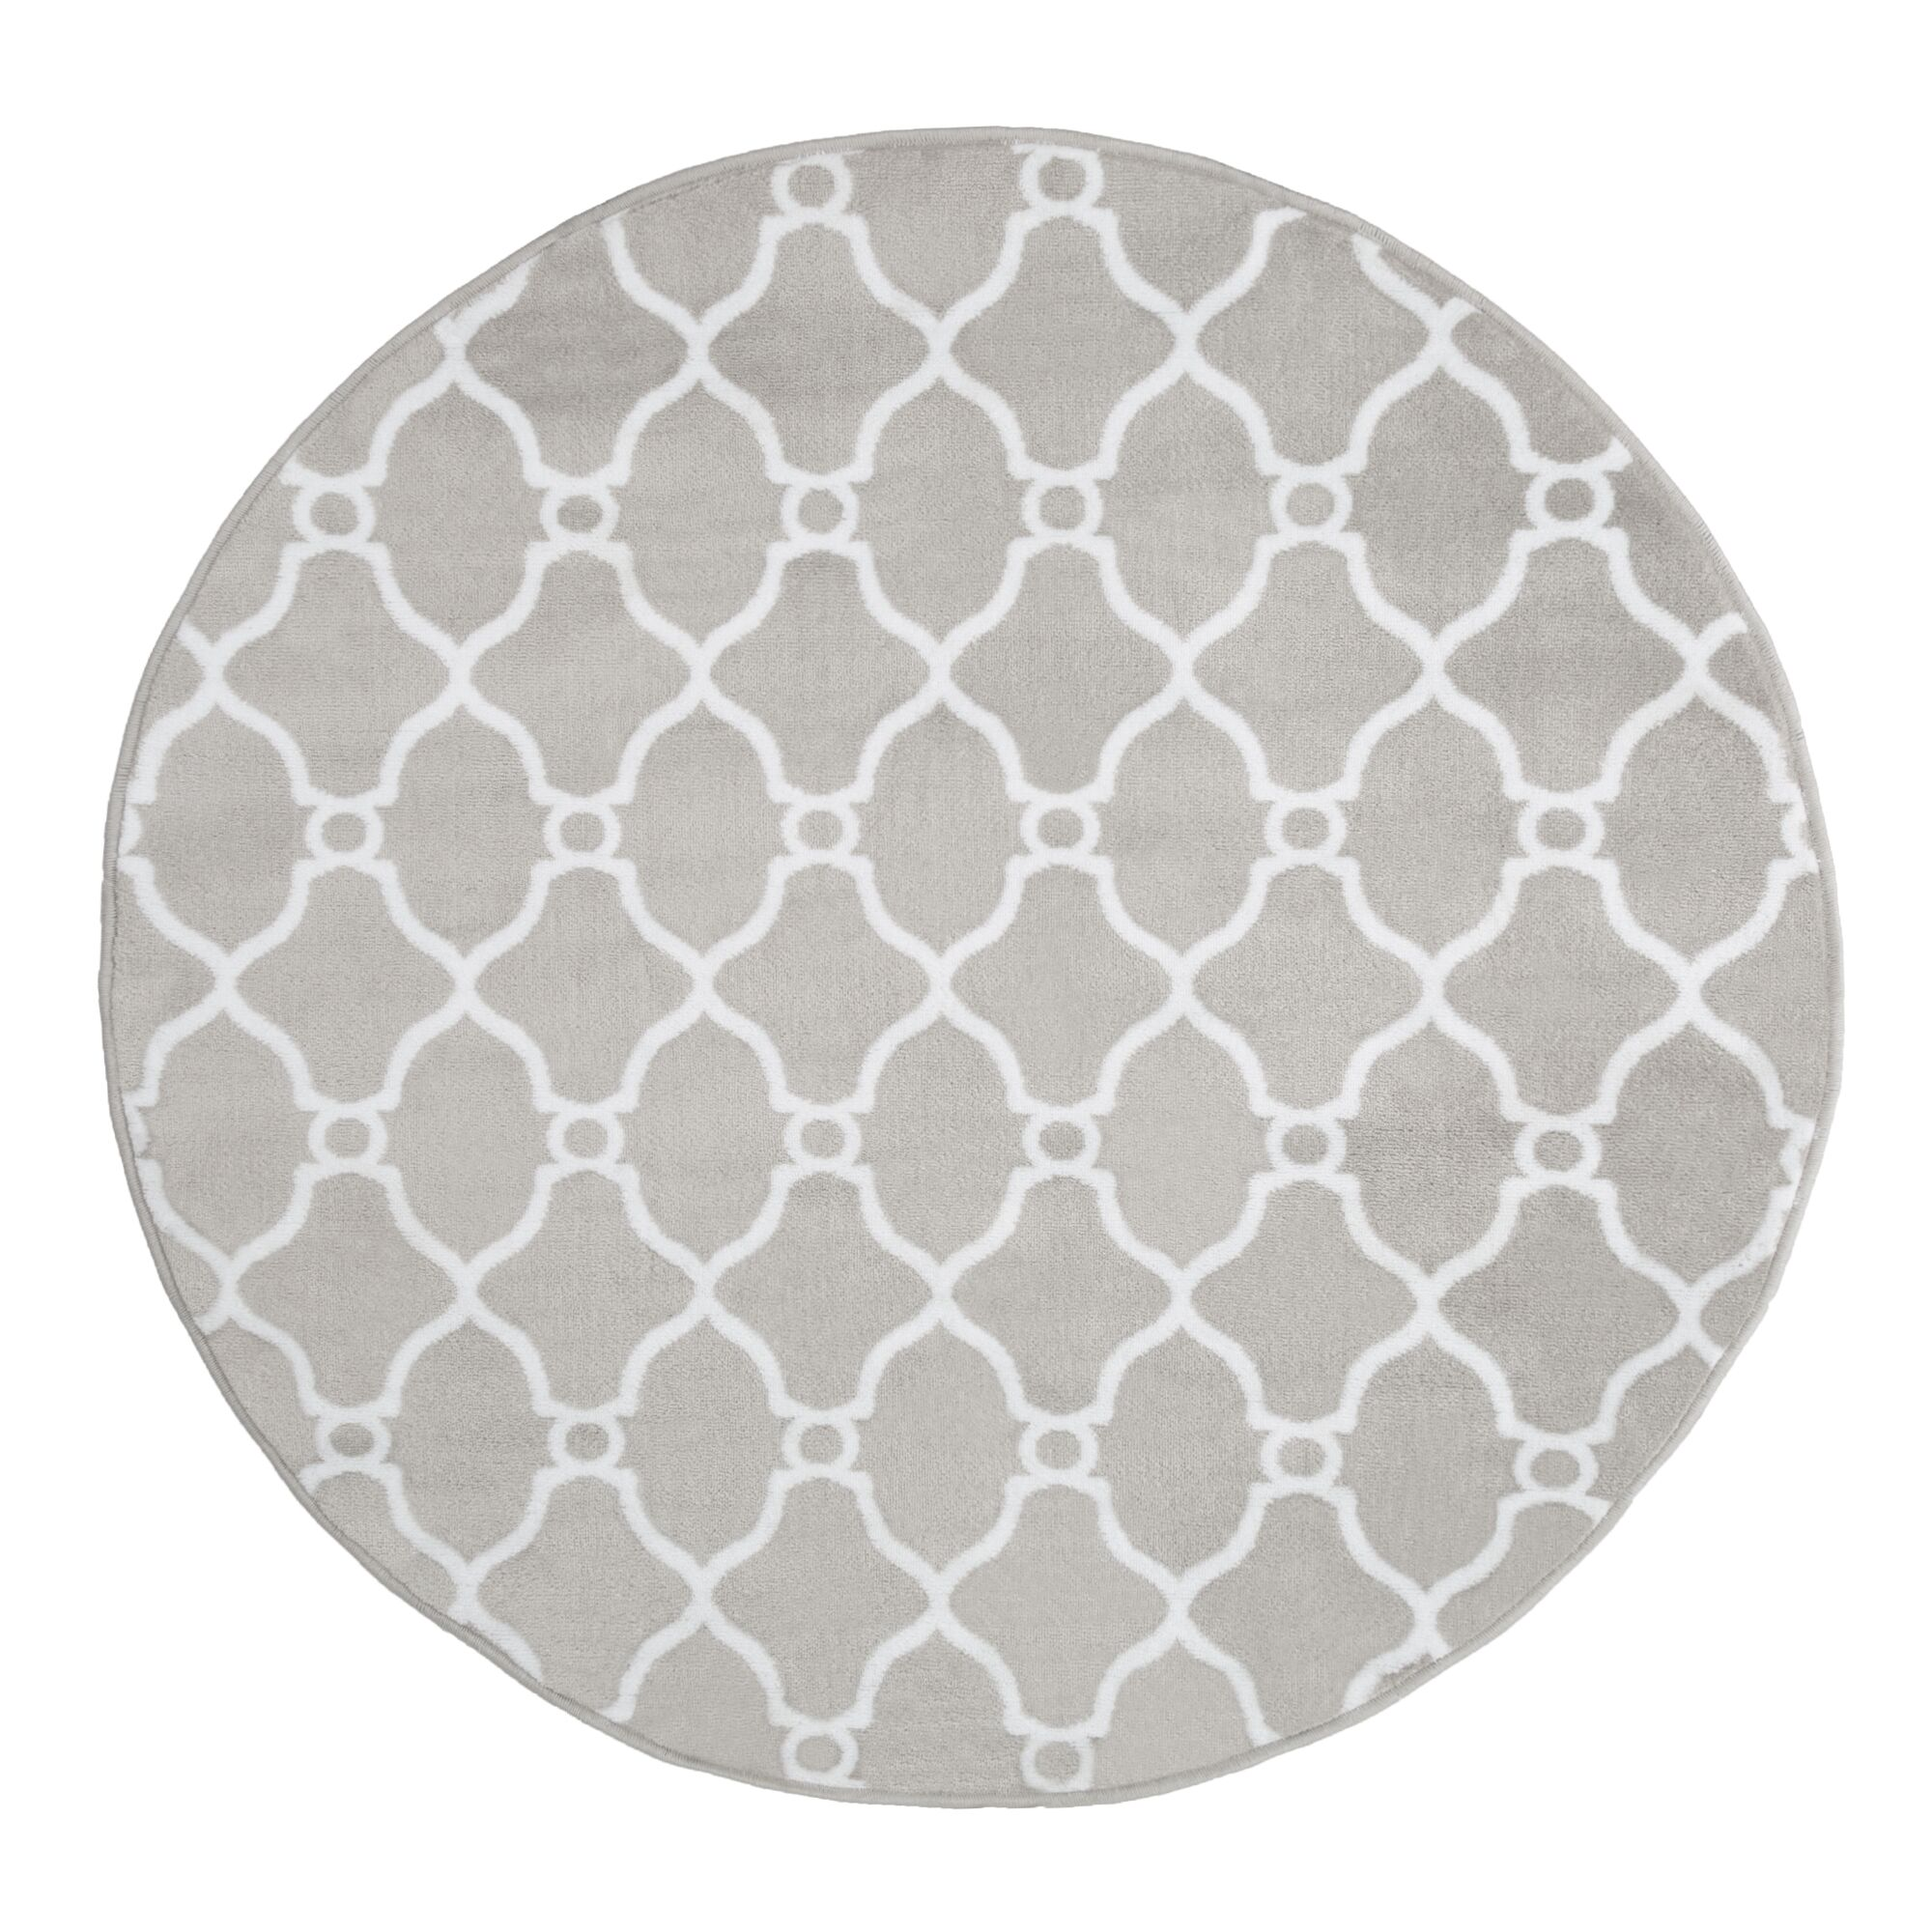 Lattice Gray Area Rug Rug Size: 5' Round